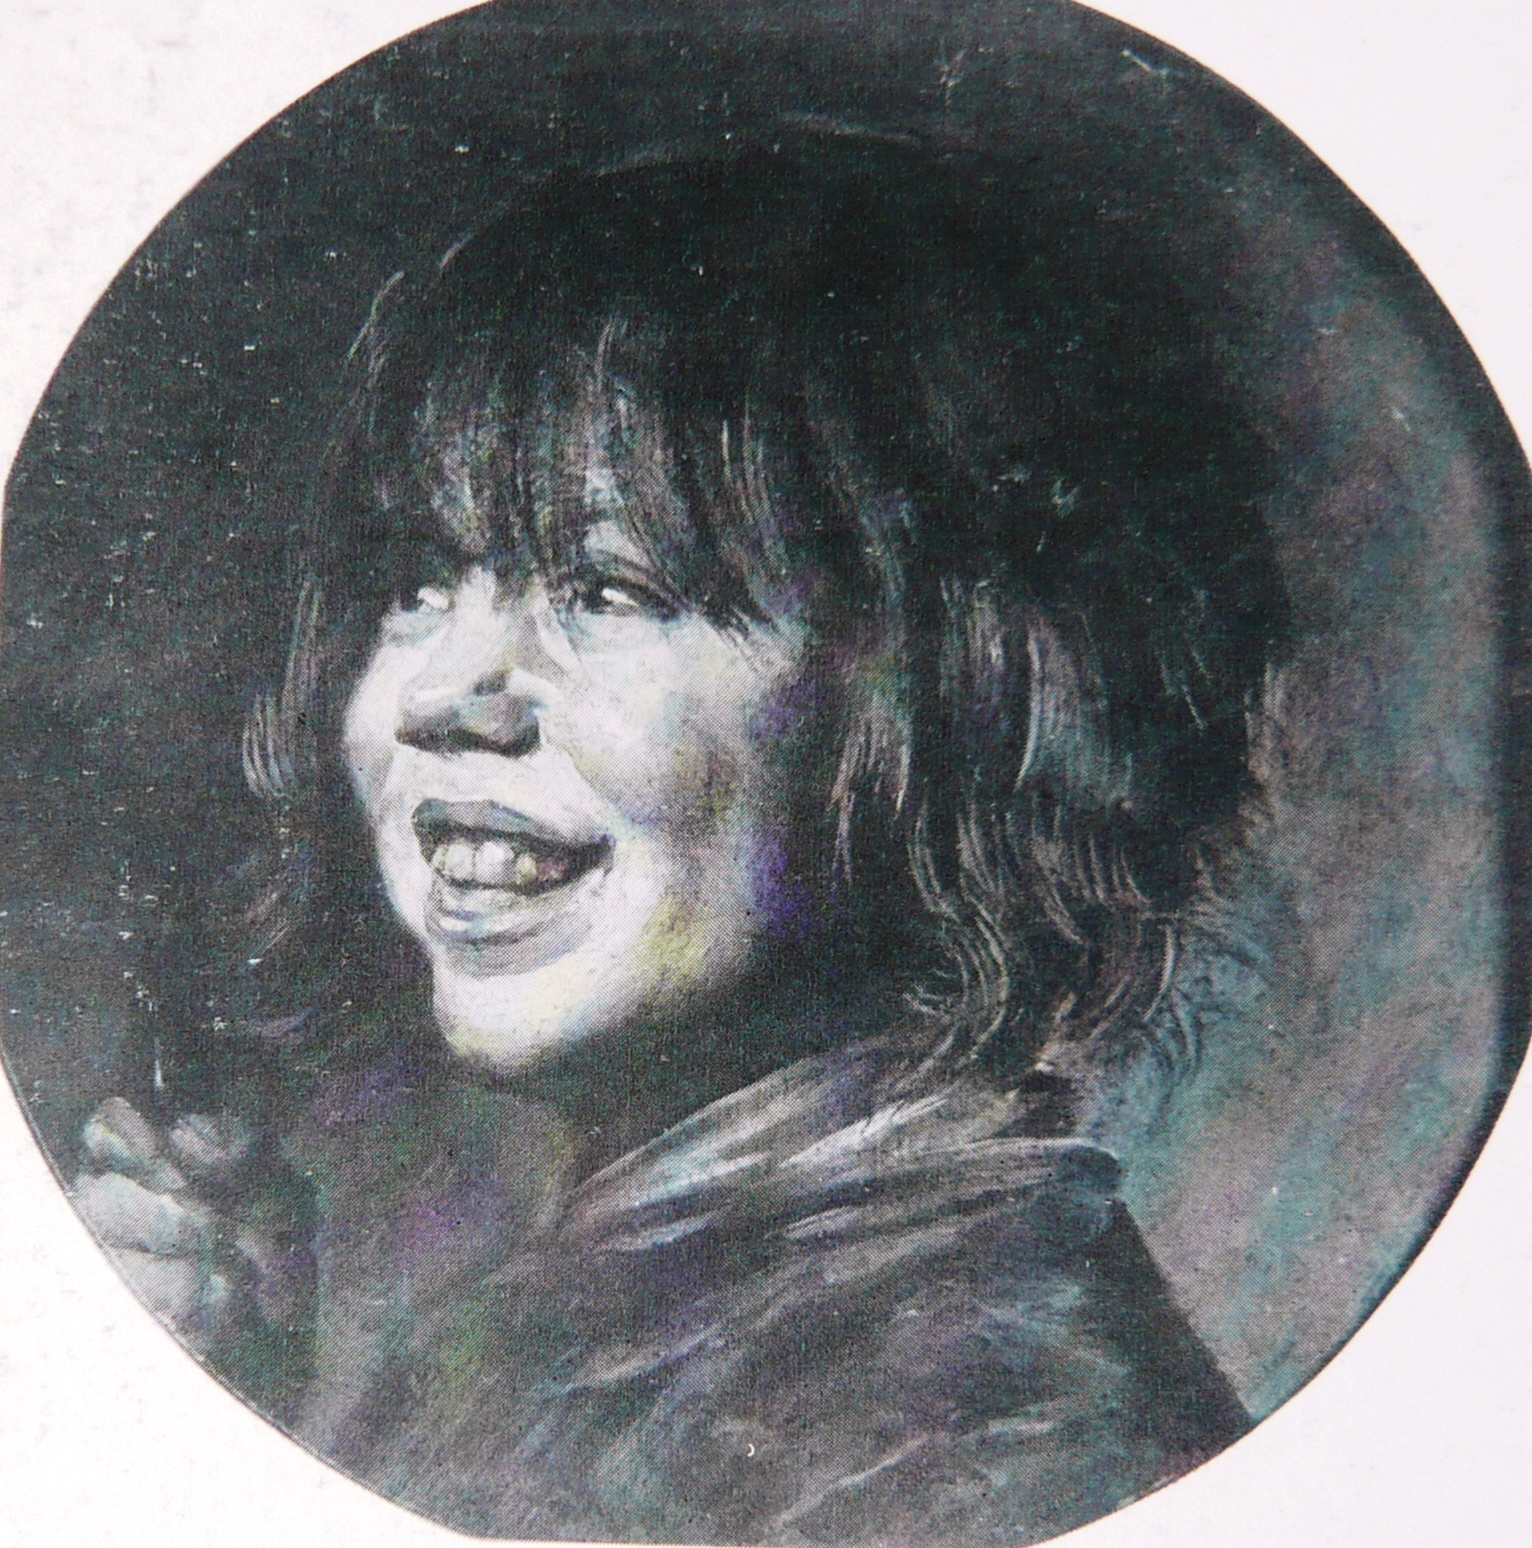 Manuela Falorni (born 1959) Erotic gallery Hallie Todd,Angela Scoular